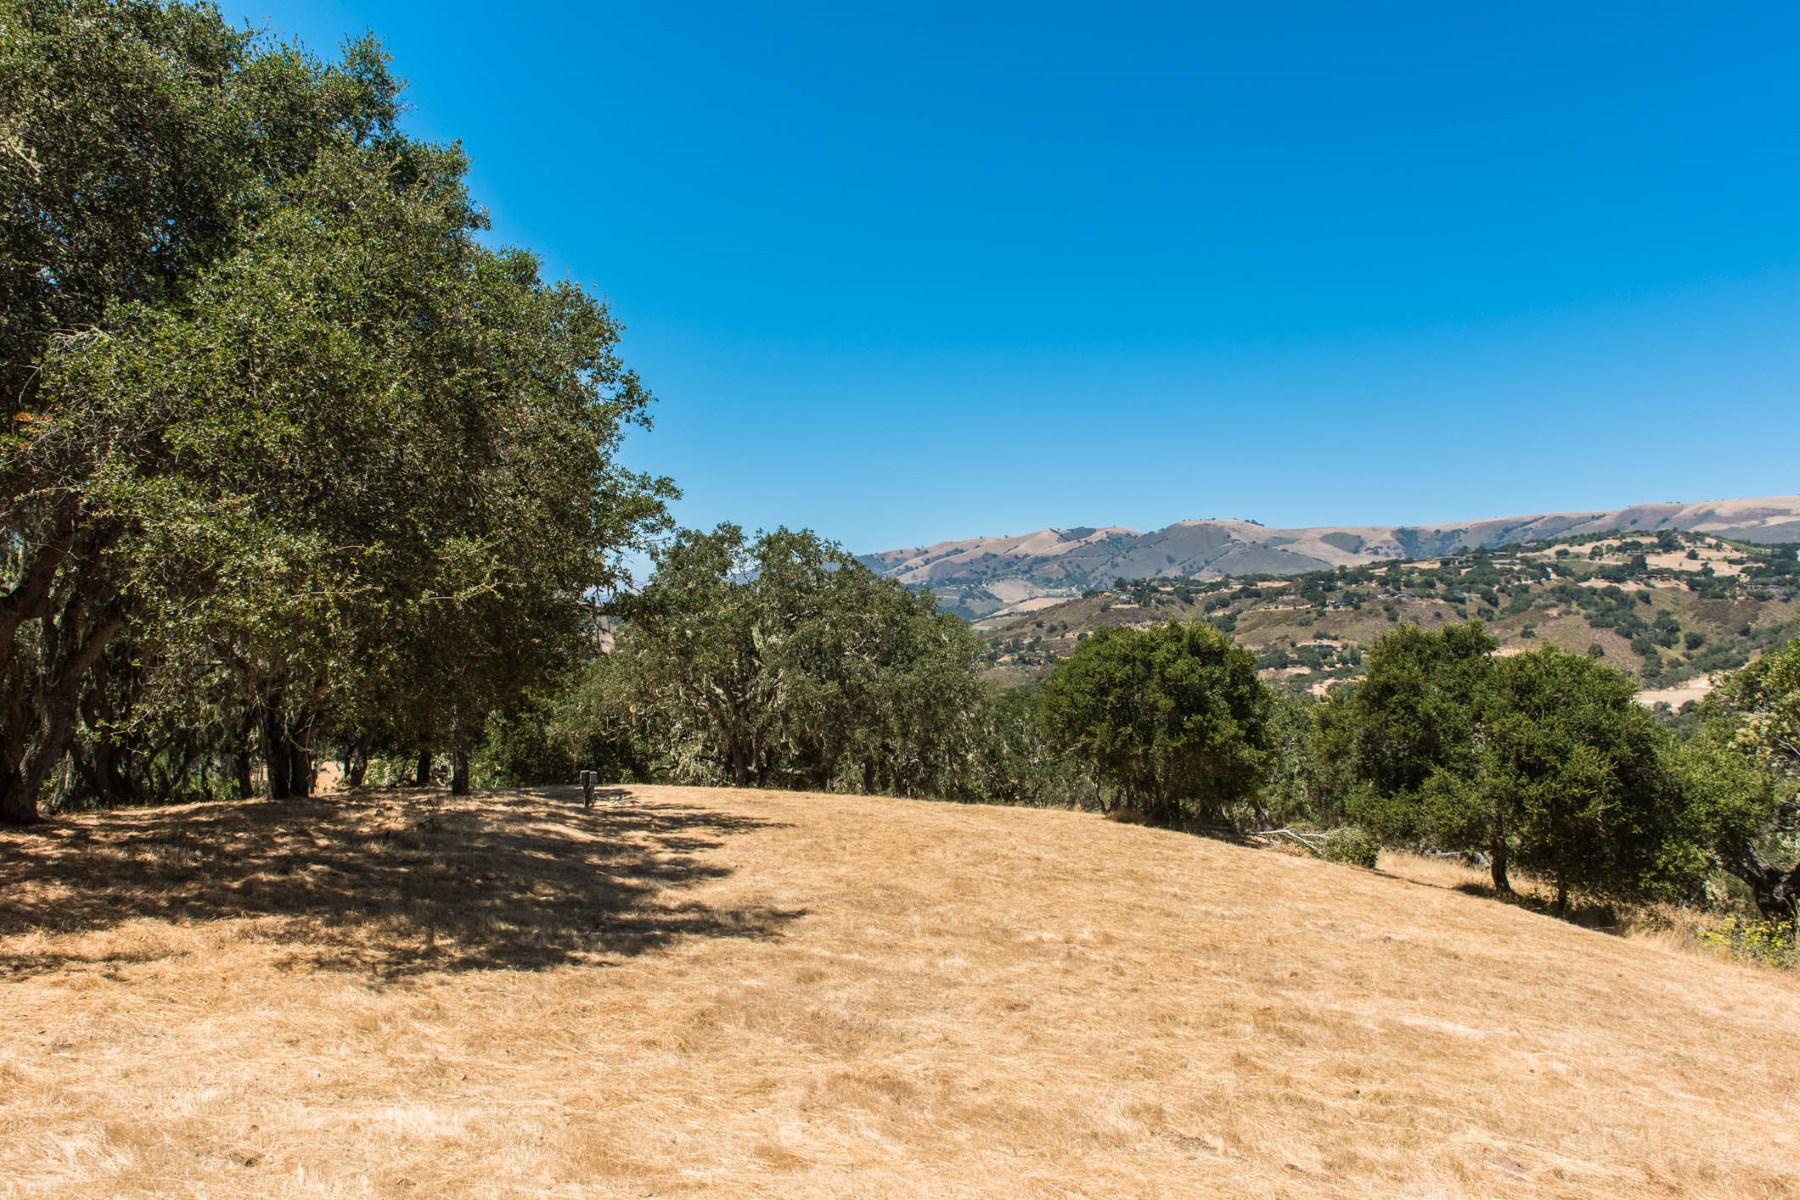 Land for Sale at Prestigious Sleepy Hollow 6+ Acre Parcel 17 Sleepy Hollow Drive Carmel Valley, California, 93924 United States